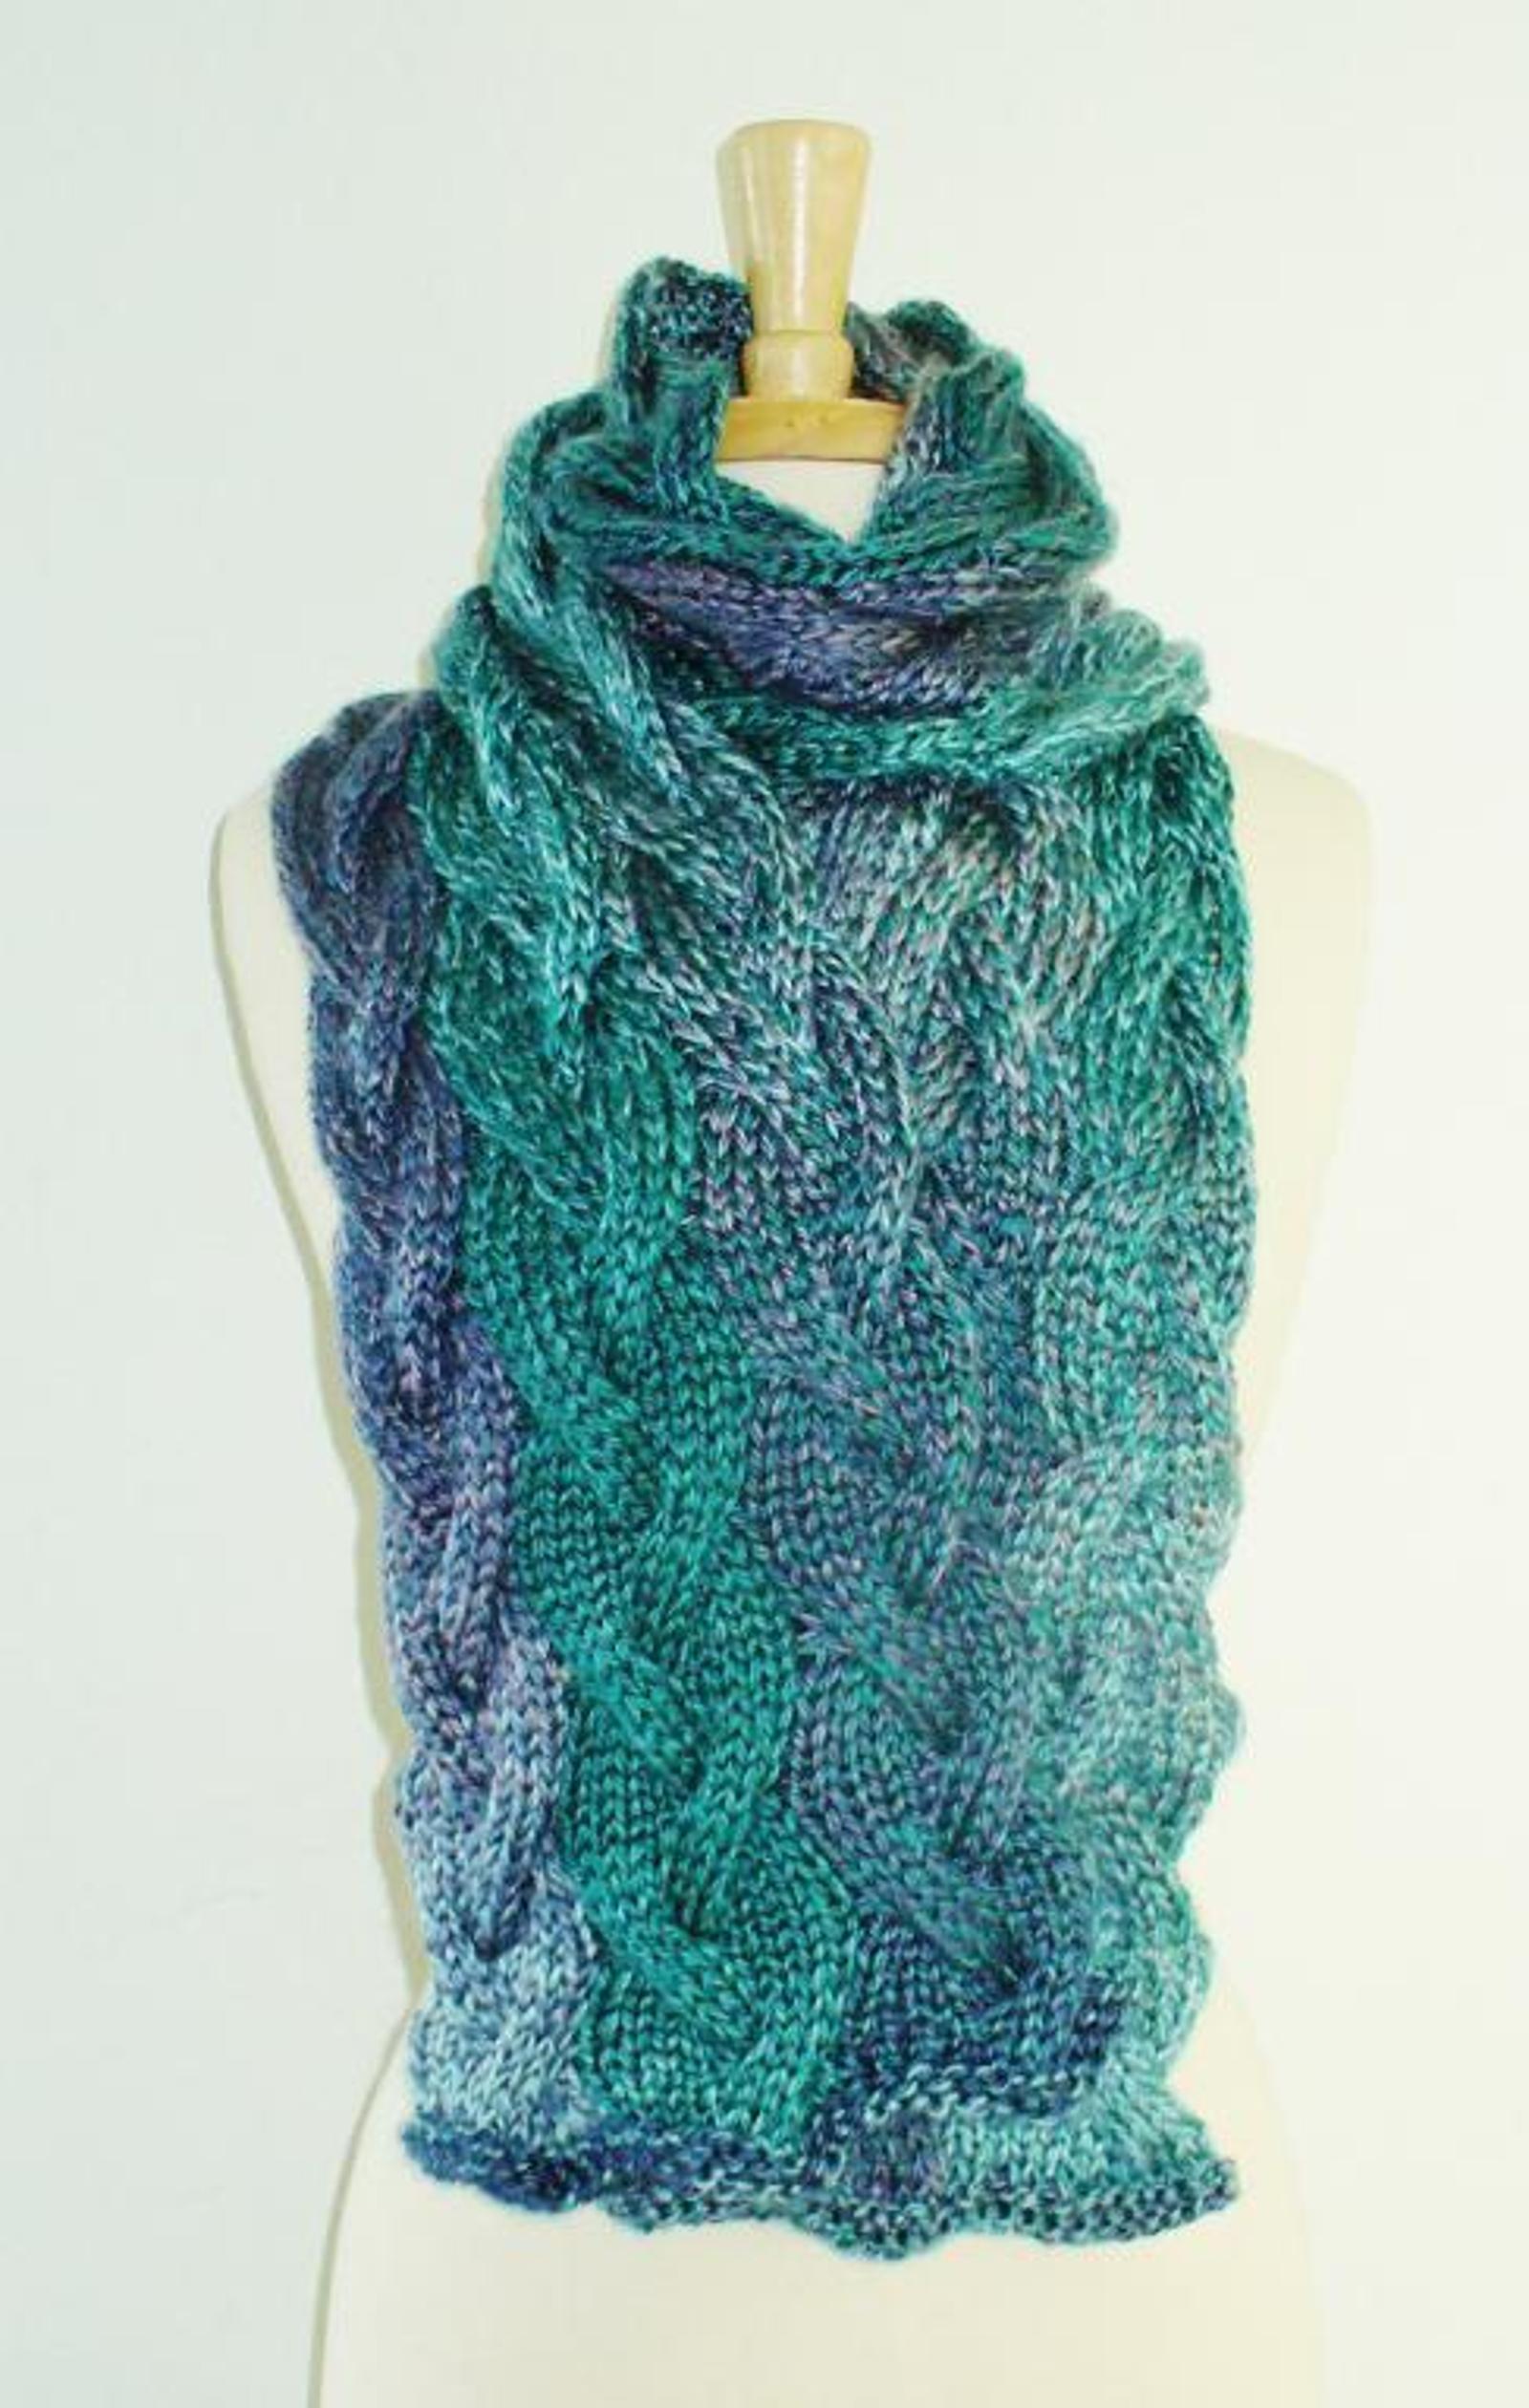 Allison's Braids Knitting Pattern